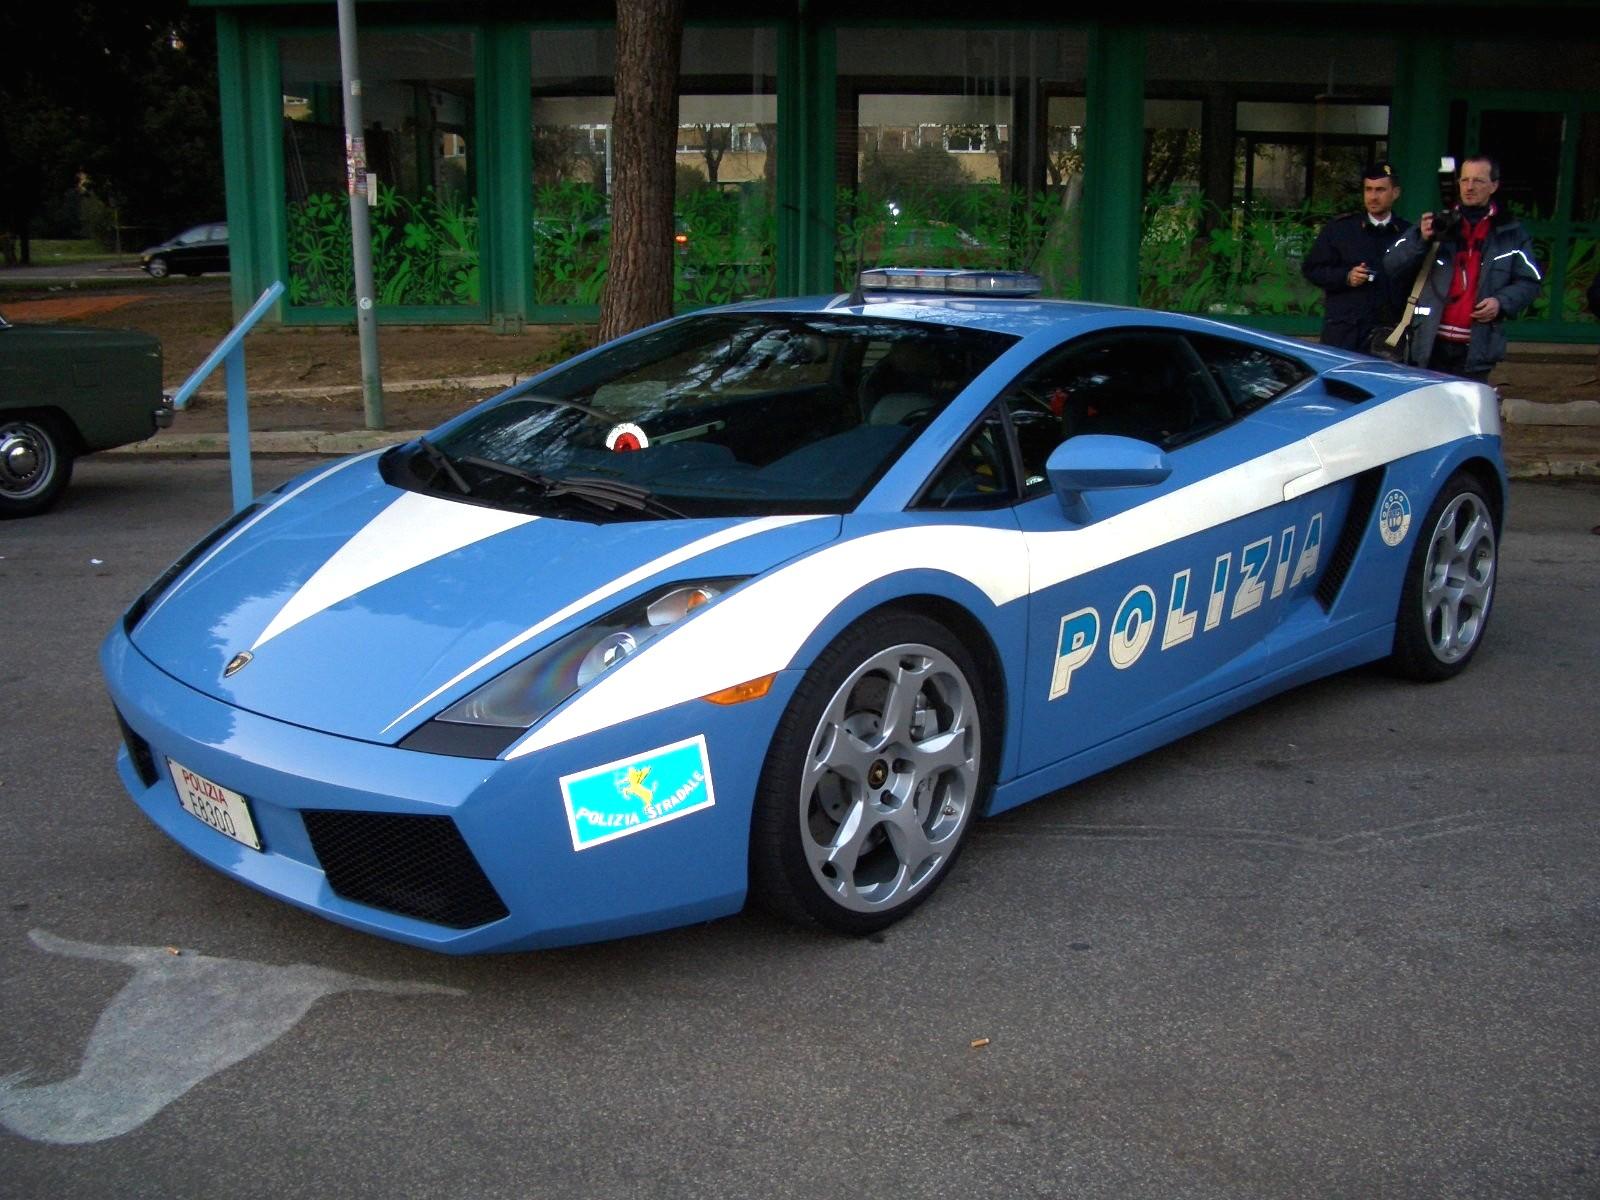 http://3.bp.blogspot.com/-pe2lP4e8U8I/TaHDNDiLc4I/AAAAAAAAAEg/mygUWmKkKZE/s1600/Lamborghini_Polizia.jpg